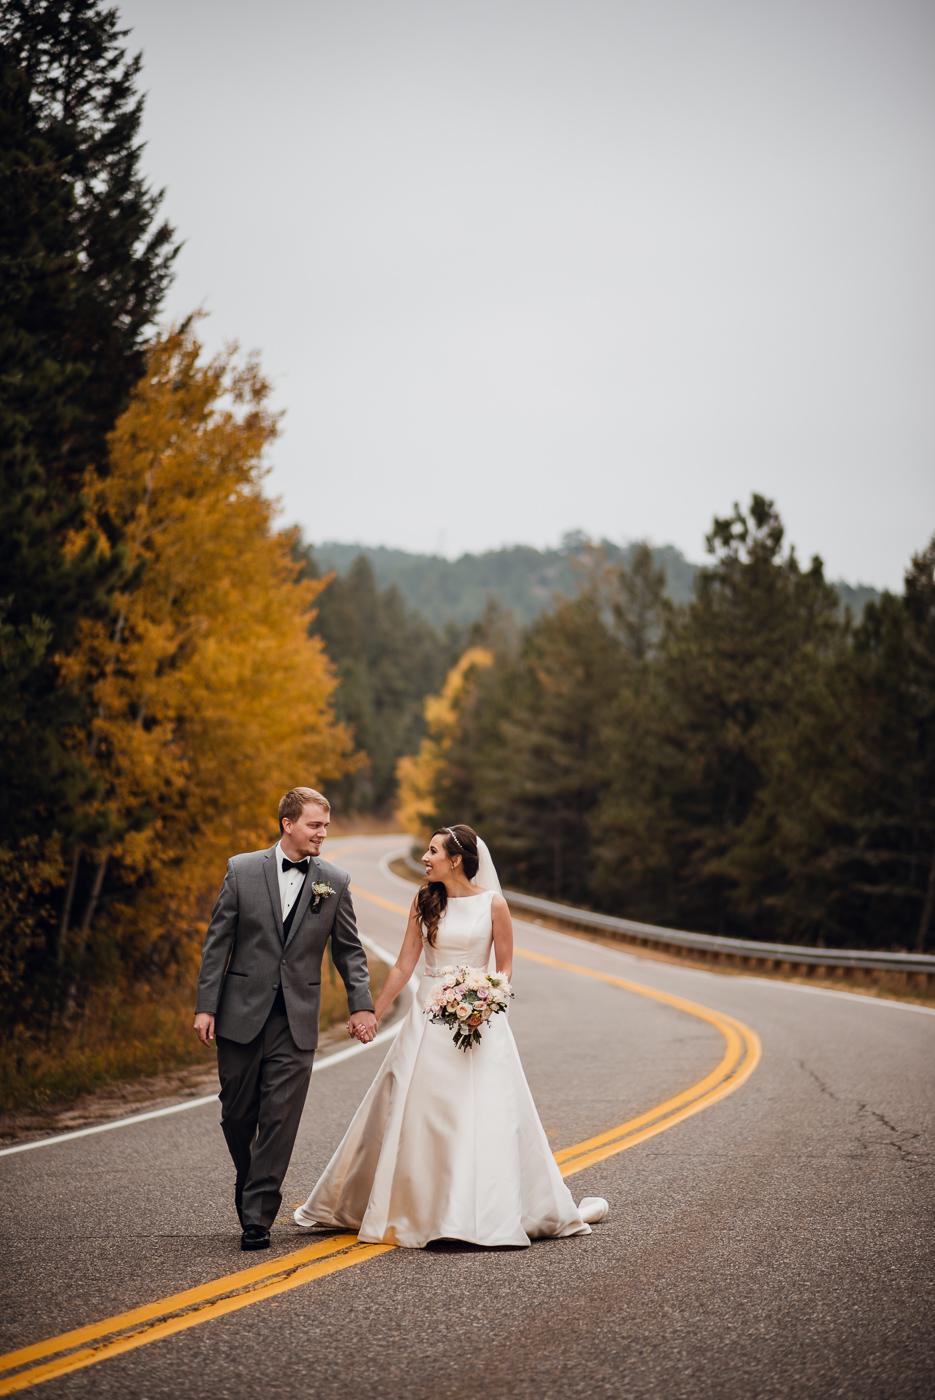 Candice Rawlin Wedding PHOCO Photography Pines Genesee Golden Colorado Fog -12.jpg